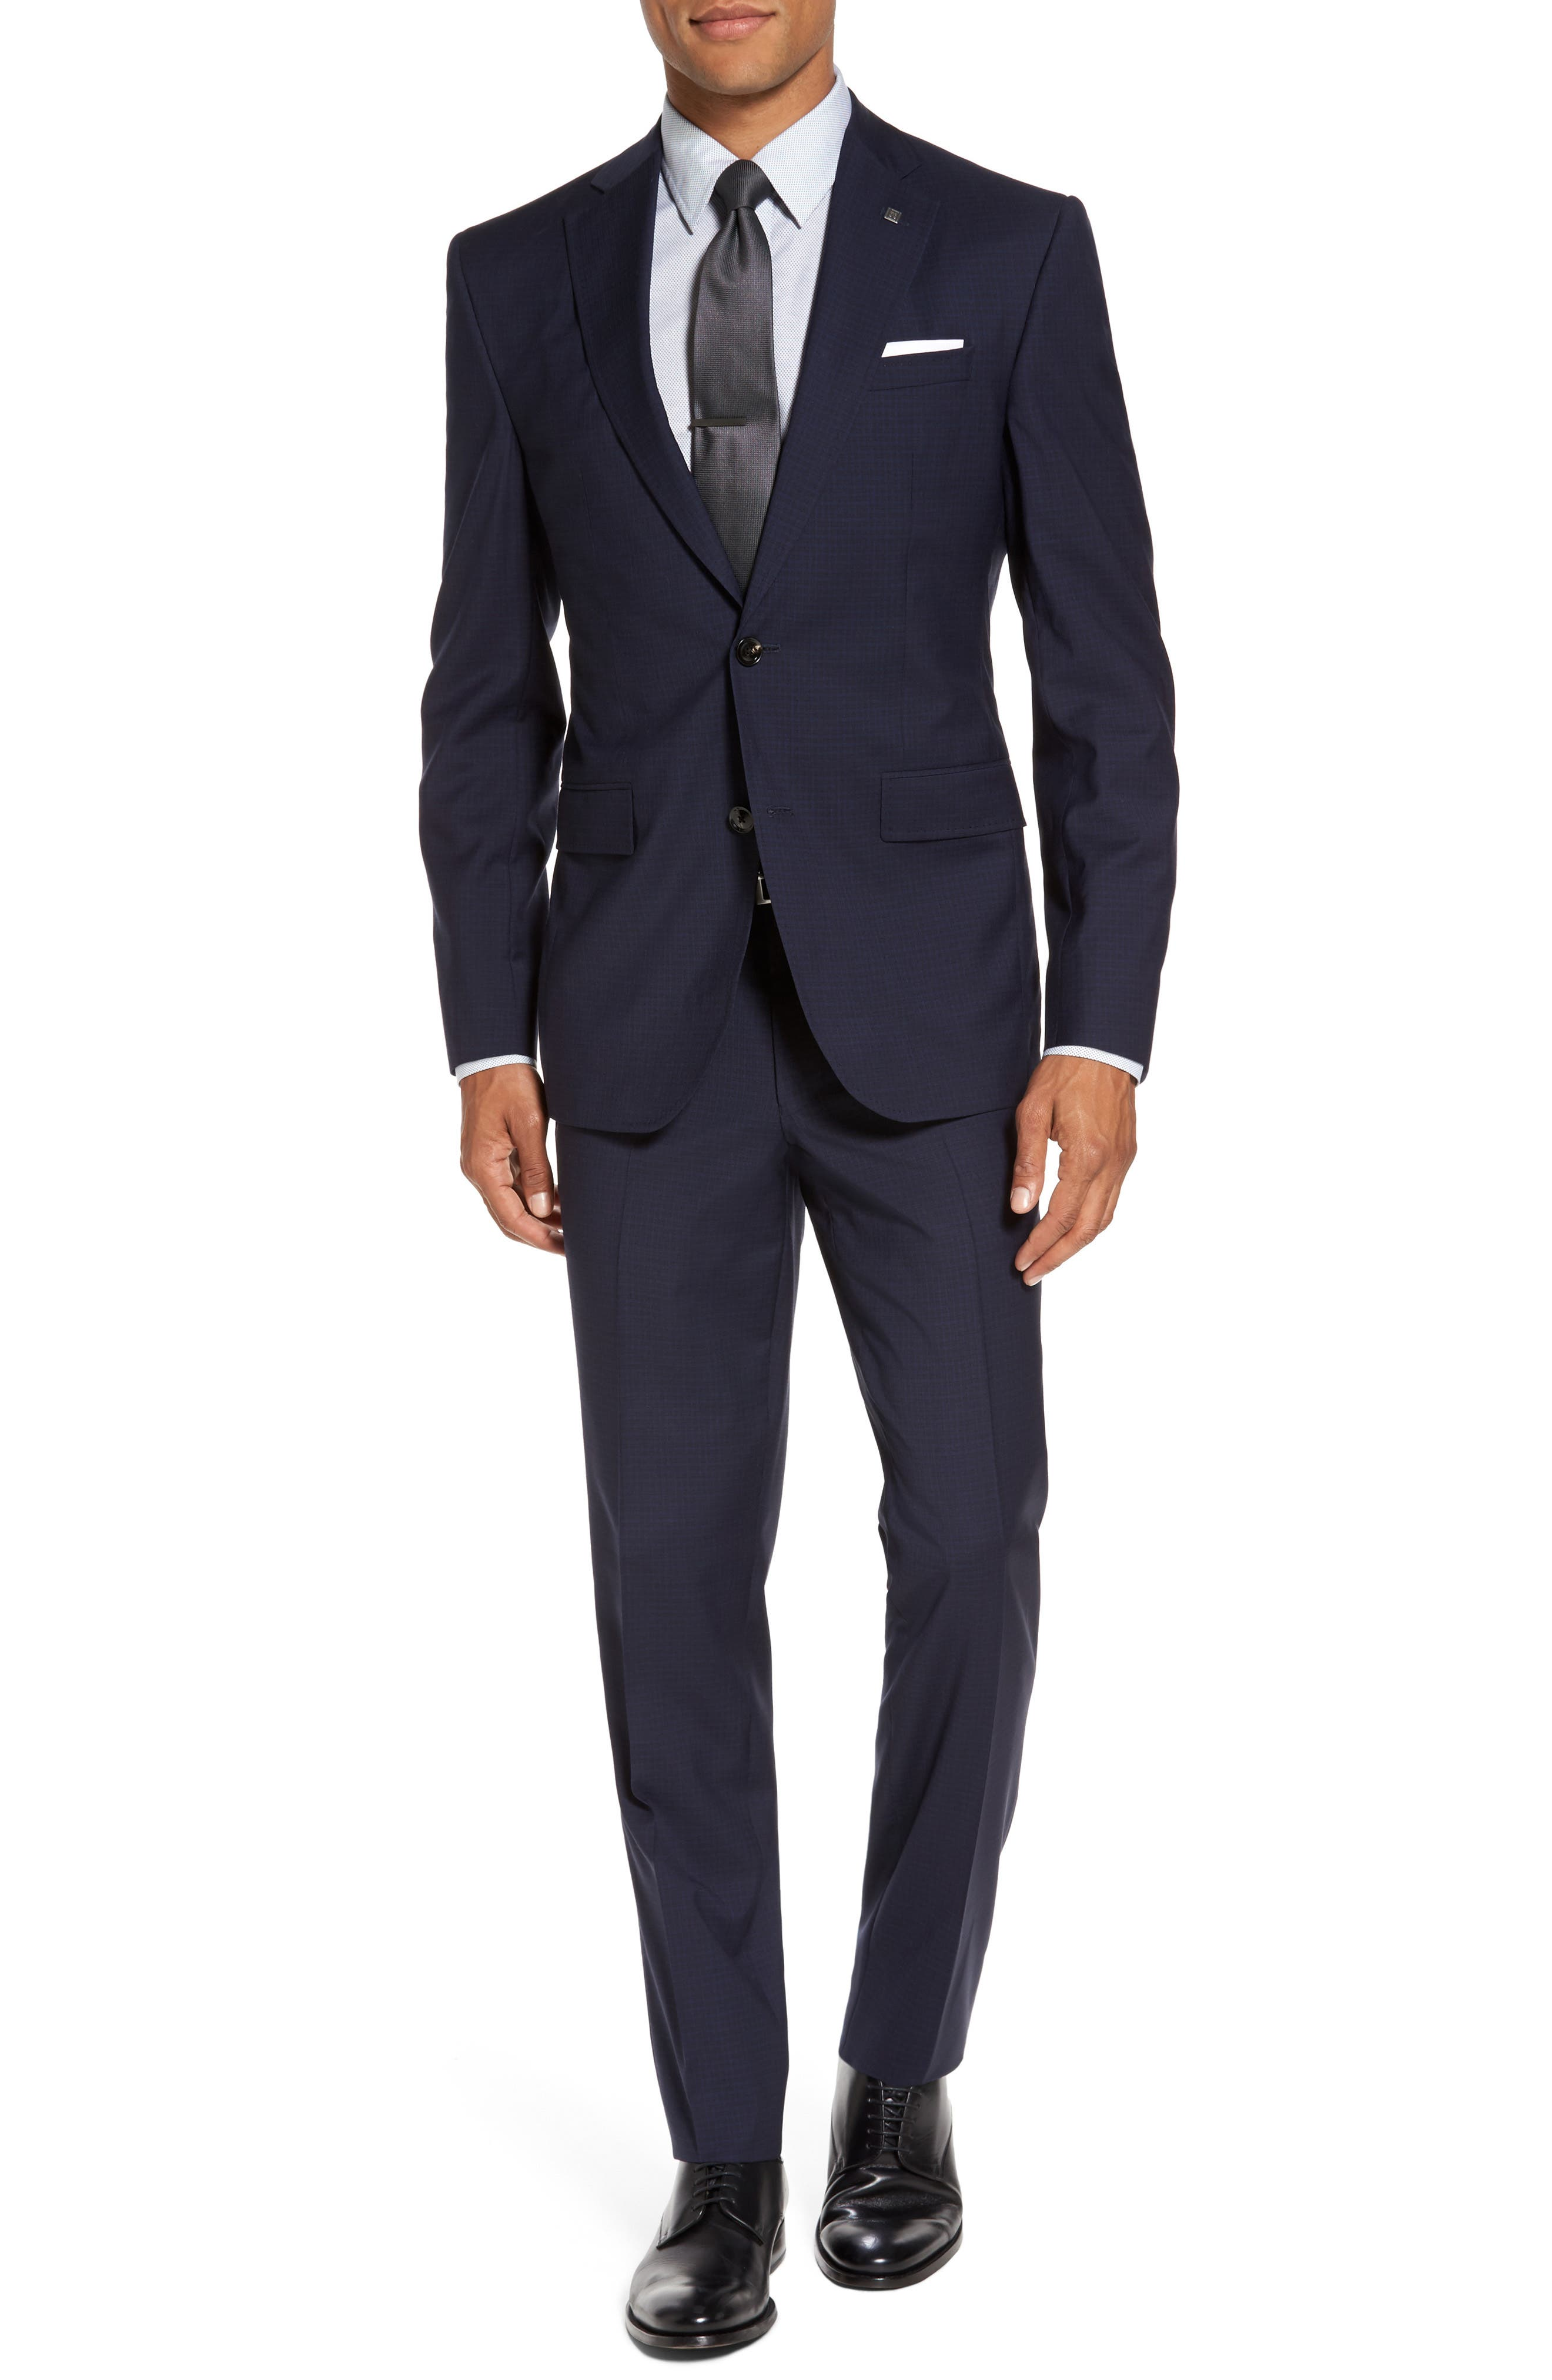 Roger Trim Fit Check Wool Suit,                         Main,                         color, Navy